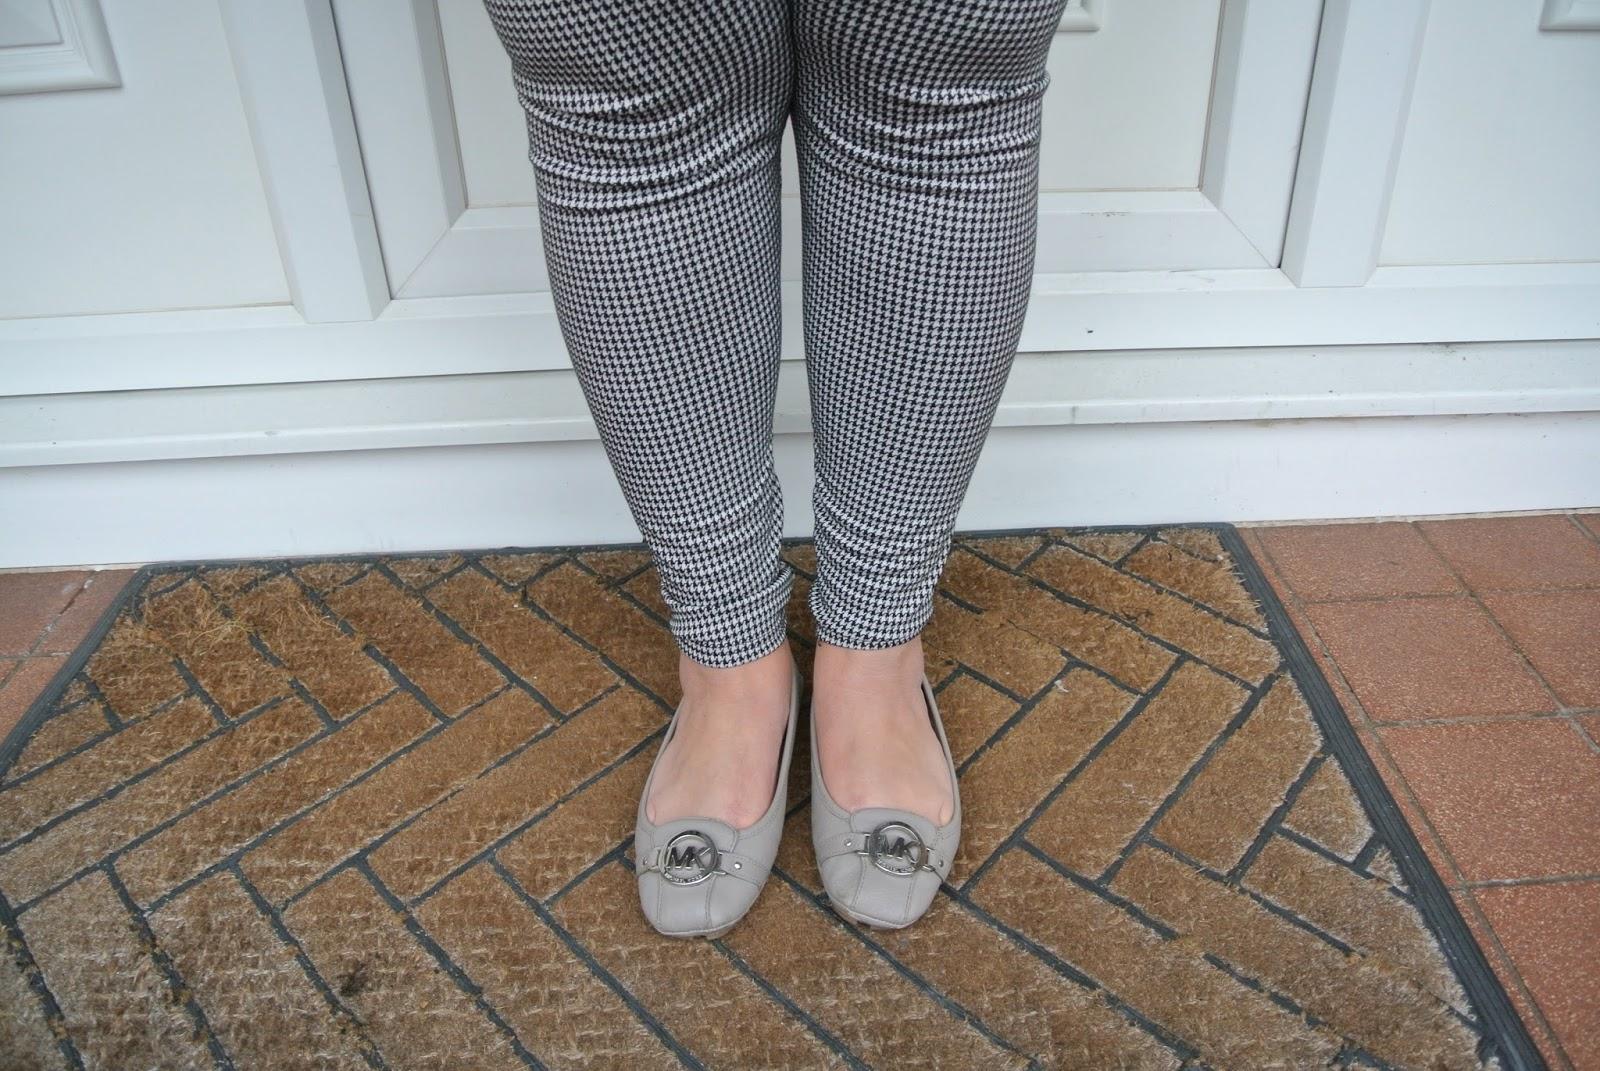 Michael kors flat shoes scarlett and jo houndstooth leggings